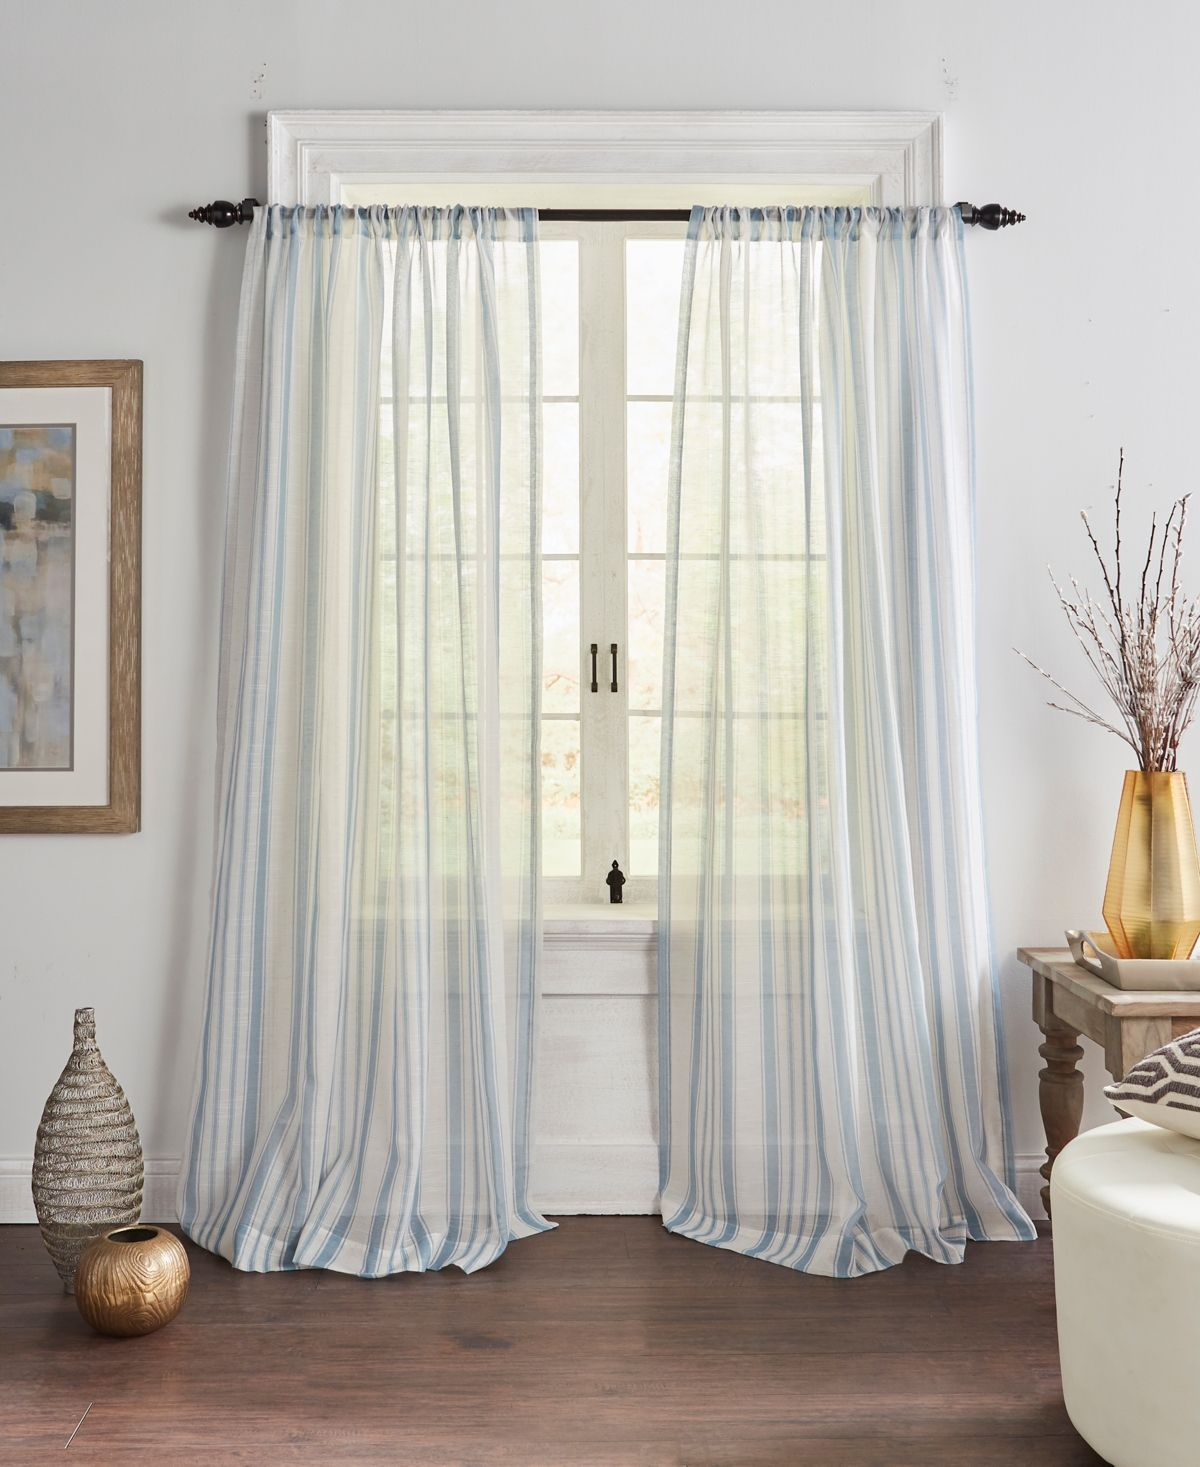 Elrene Hampton Stripe Sheer Window Curtain Reviews Home Macy S Elrene Home Fashions Curtains Living Room Panel Curtains Sheer curtain ideas for living room